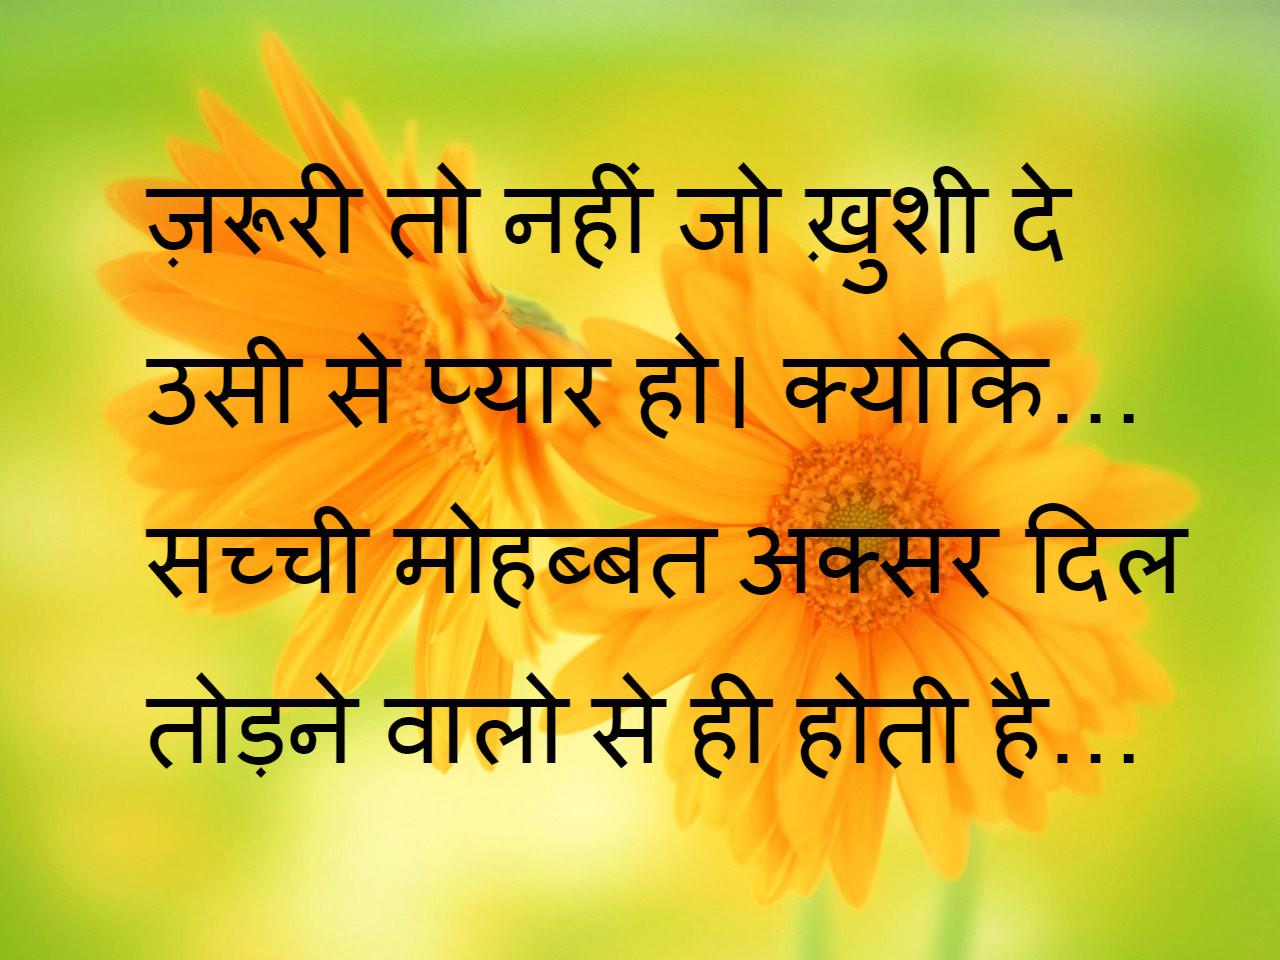 Sad Quotes Wallpapers In Urdu Images Hi Images Shayari New Shayari 2016 Romantic Hindi Pic